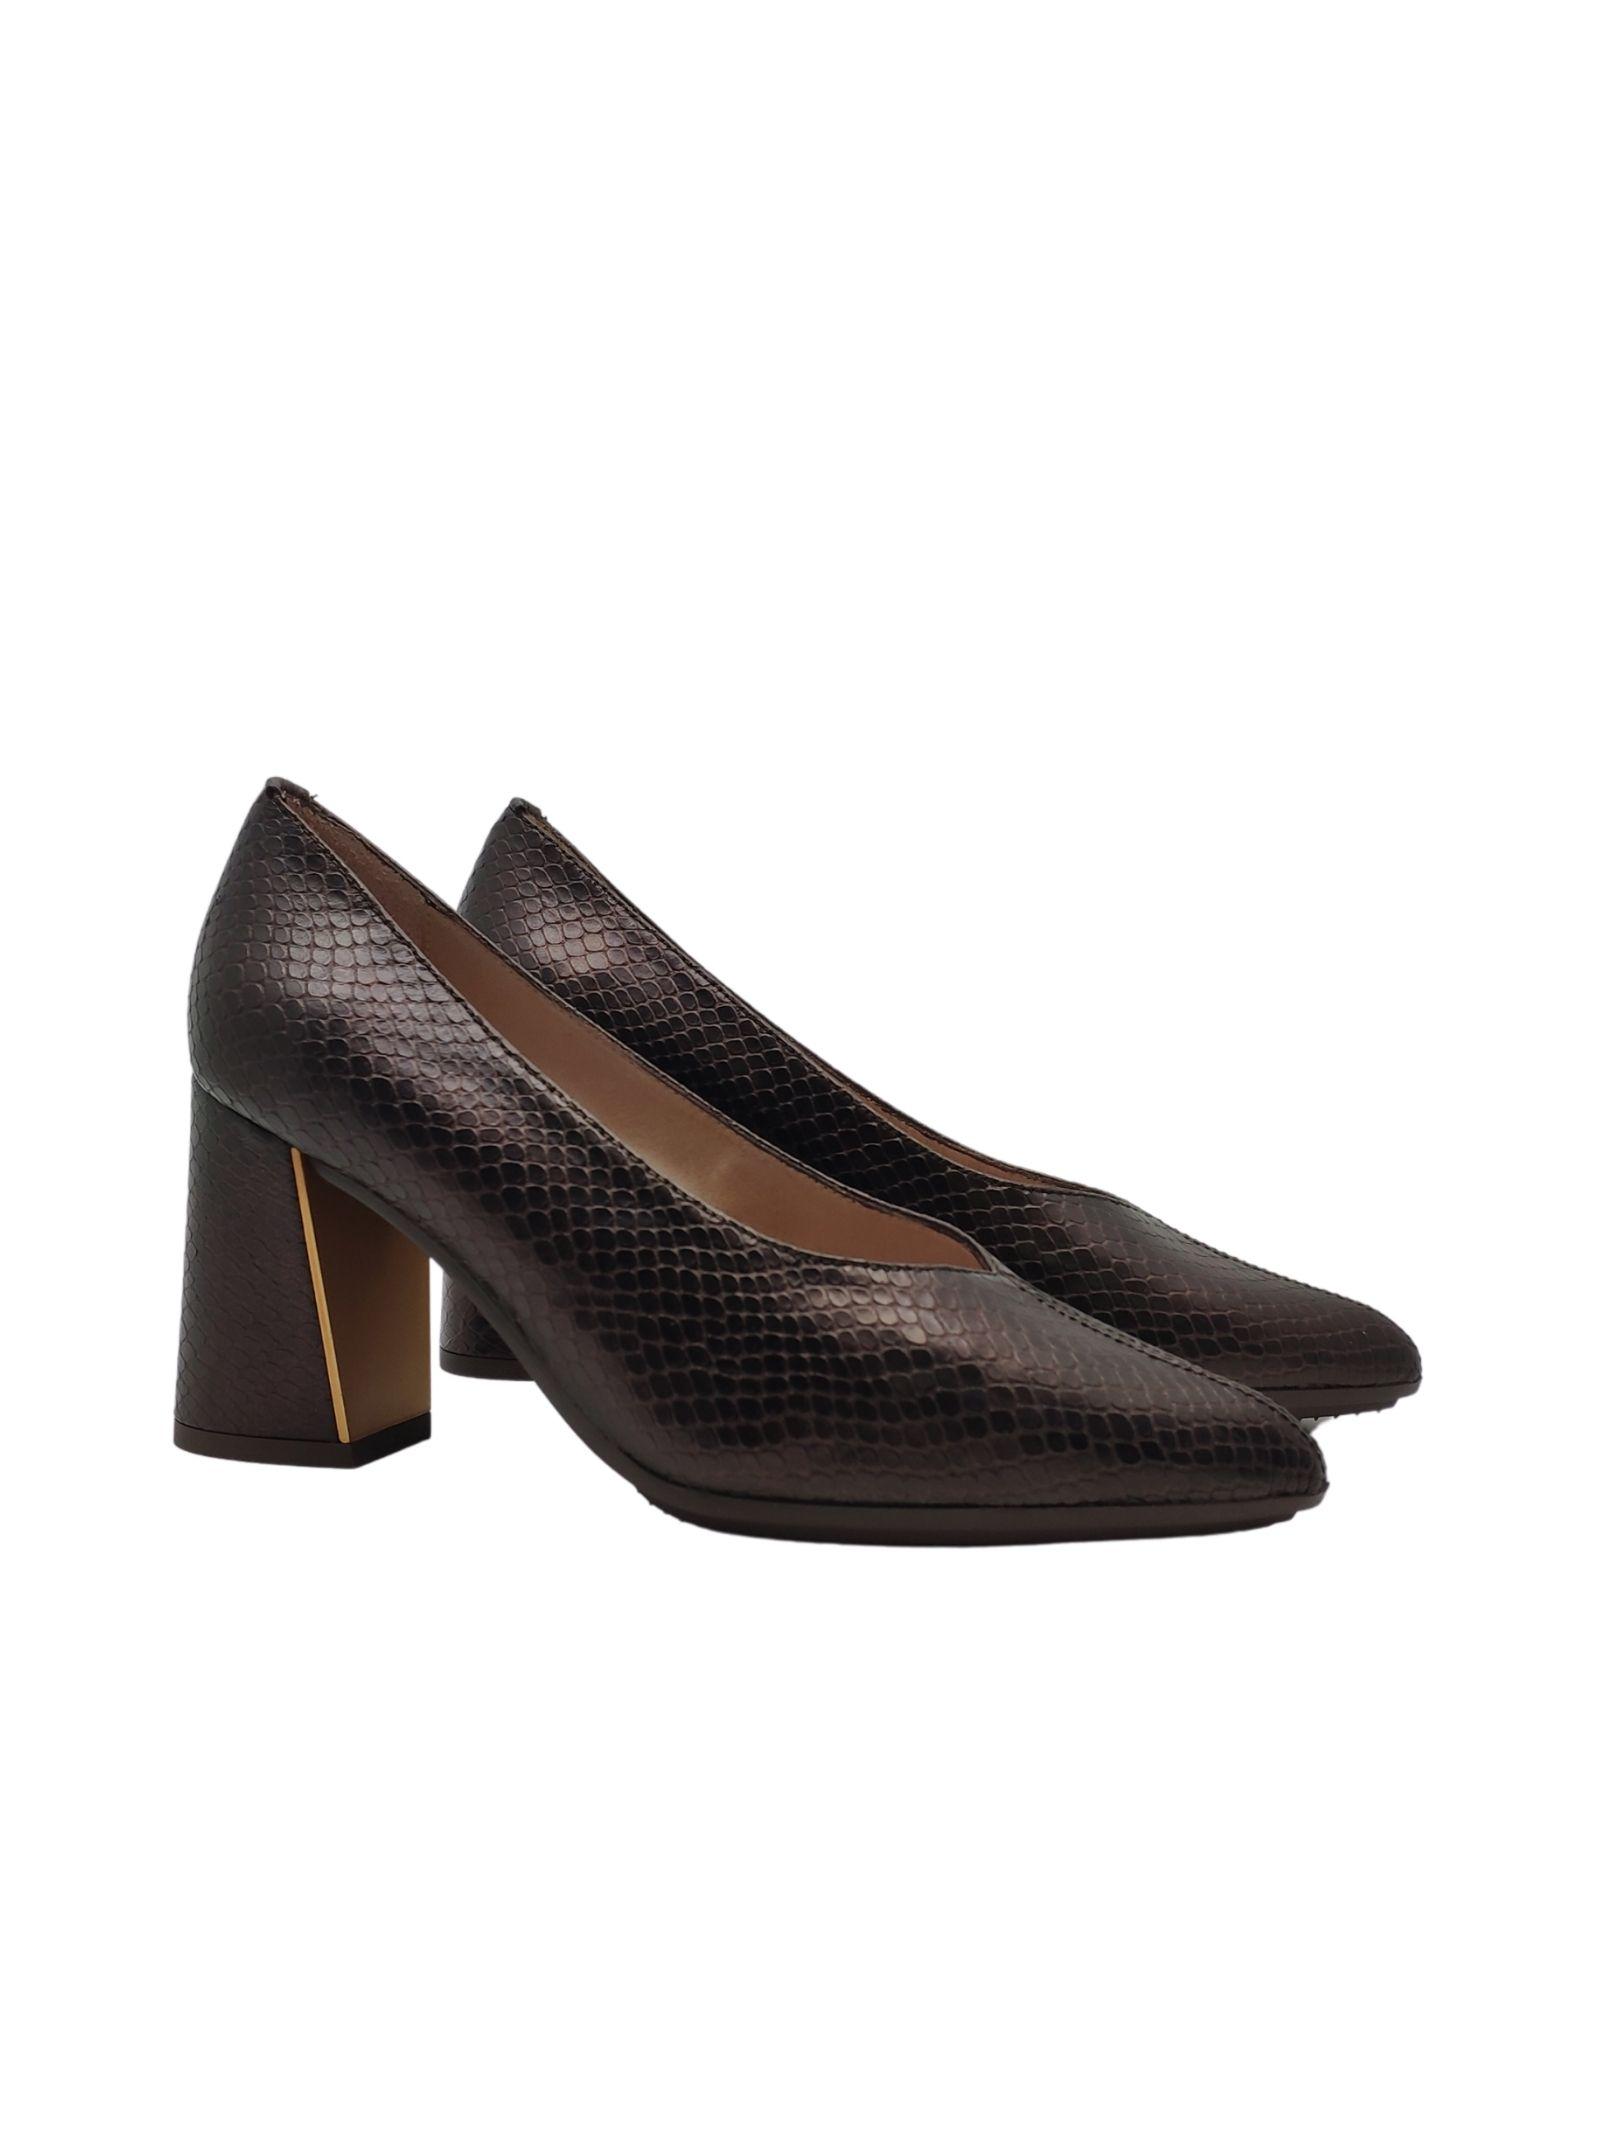 Women's High Heel Décolleté Hispanitas | Pumps | HI00723BRONZO